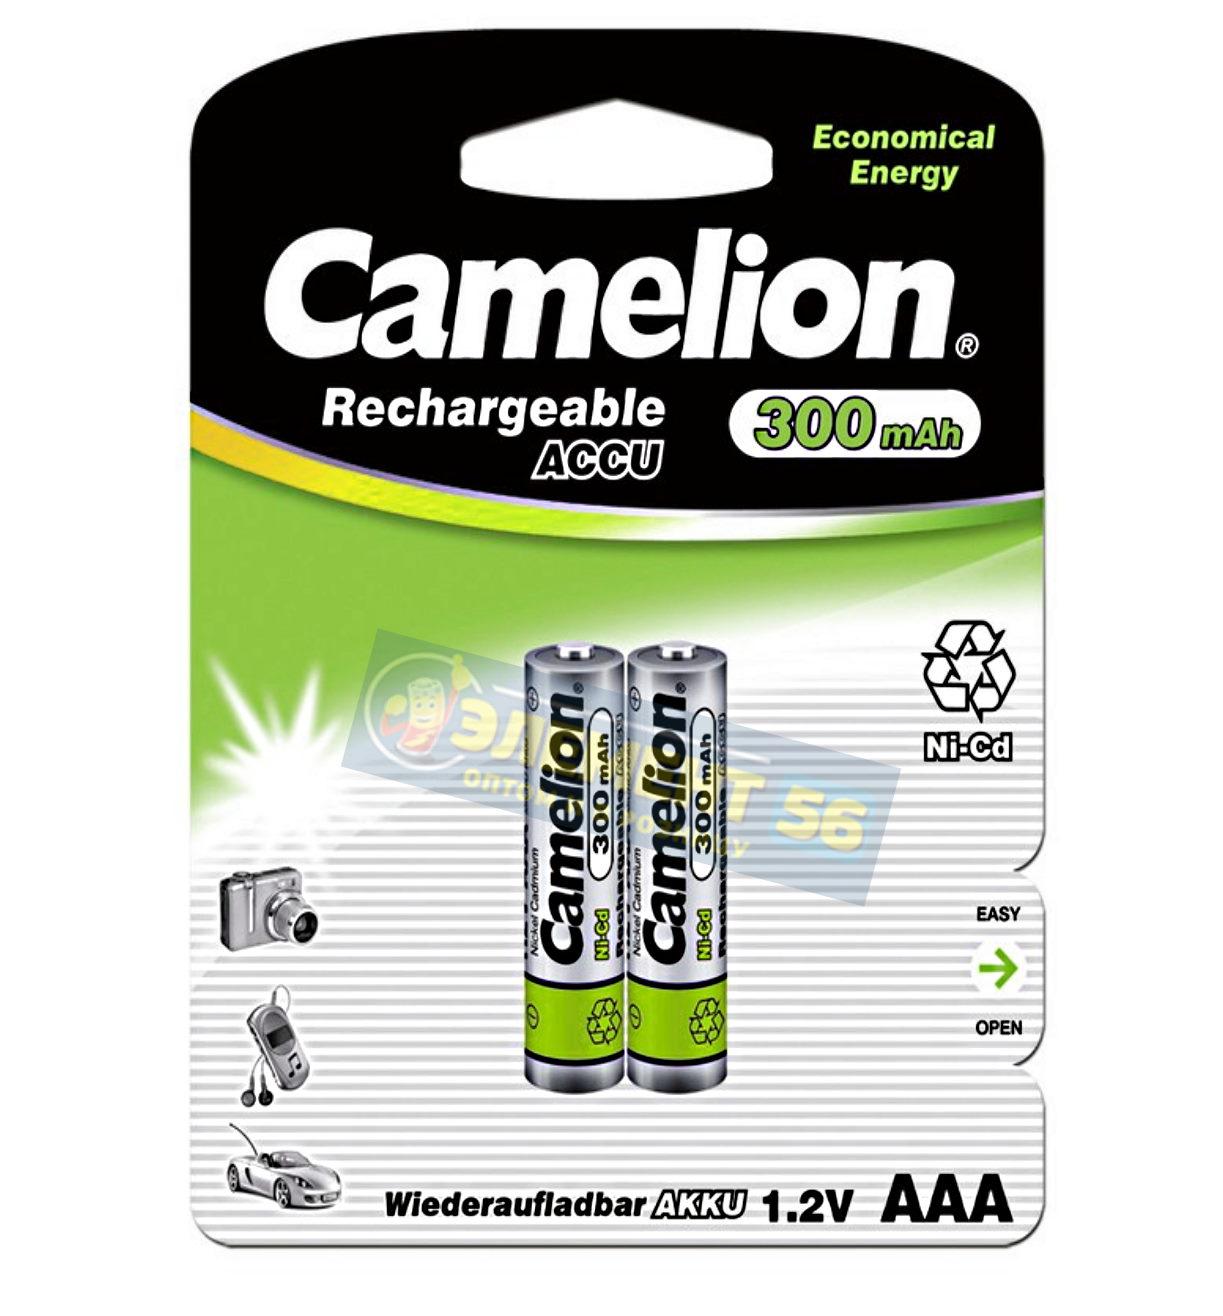 Аккумулятор CAMELION AAA, KR03 (300 mAh) MN2400, А286, 24A, AM4, UM4, HP16 2BL (2) (24) (480)